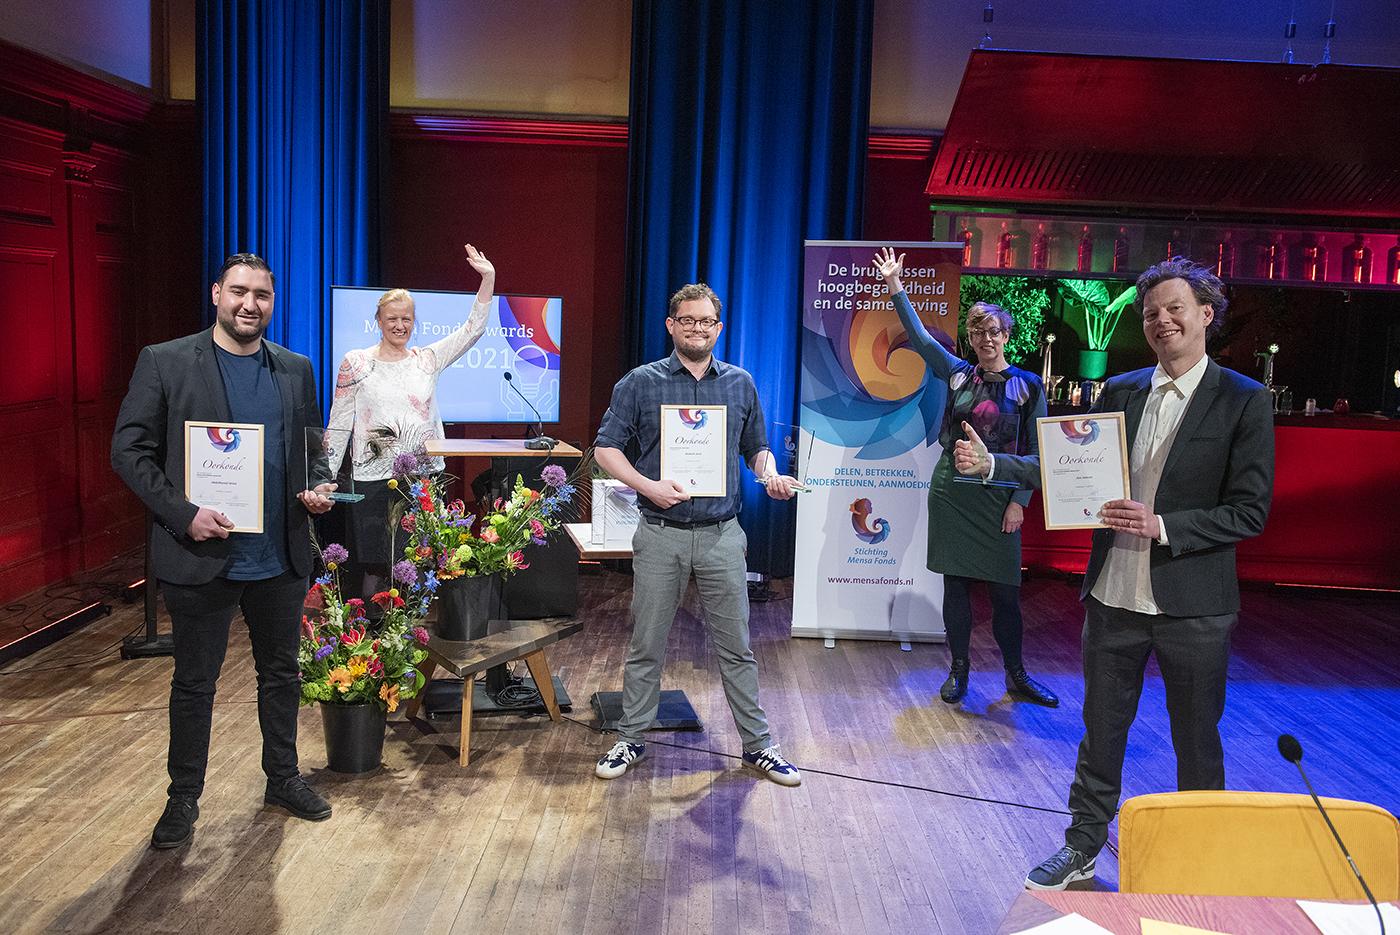 Winnaars Mensa Fonds Awards